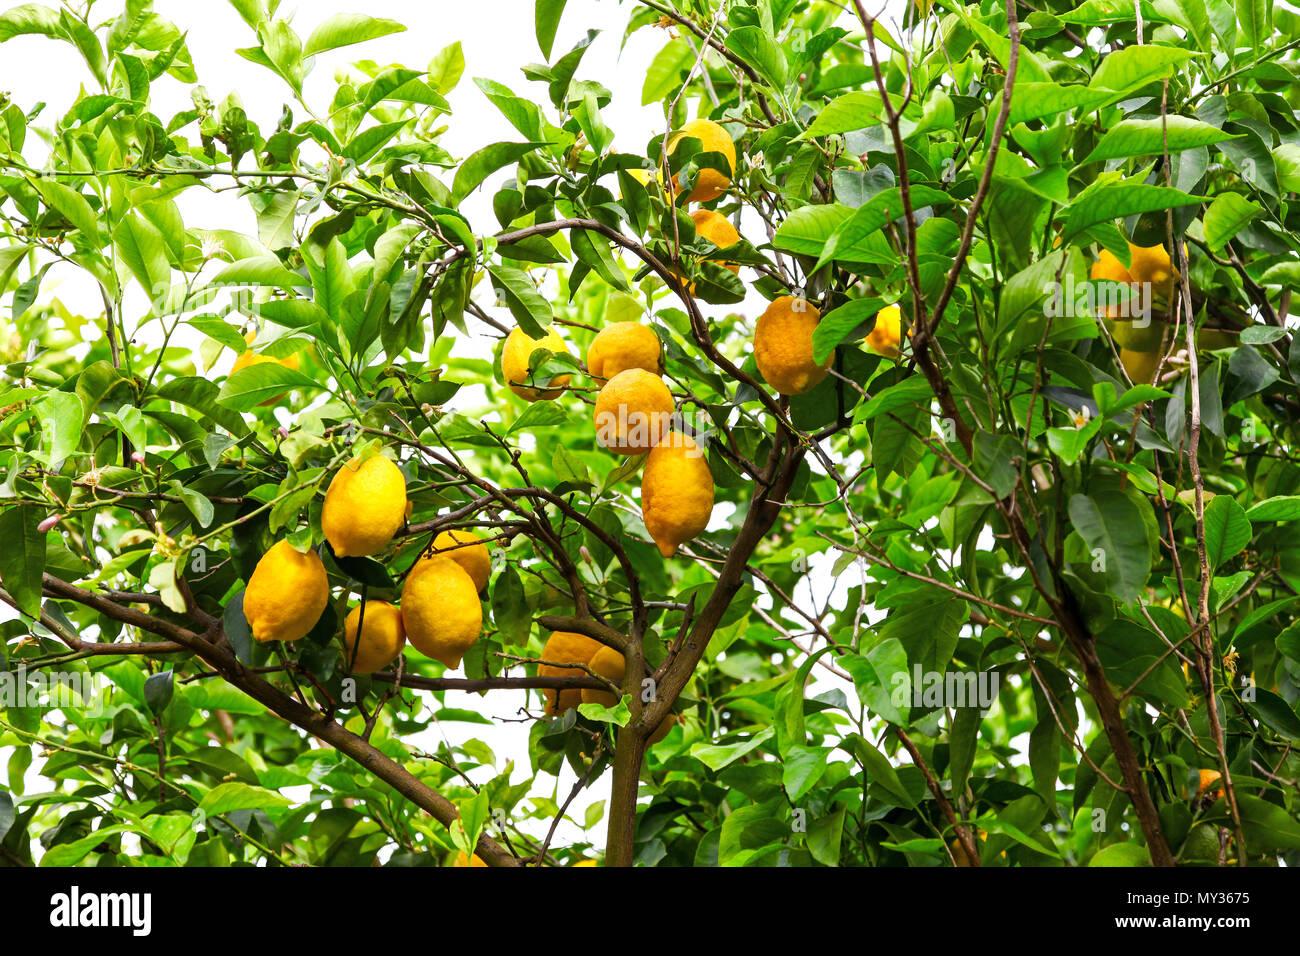 Ripe Lemons on a tree in Sorrento, Italy - Stock Image